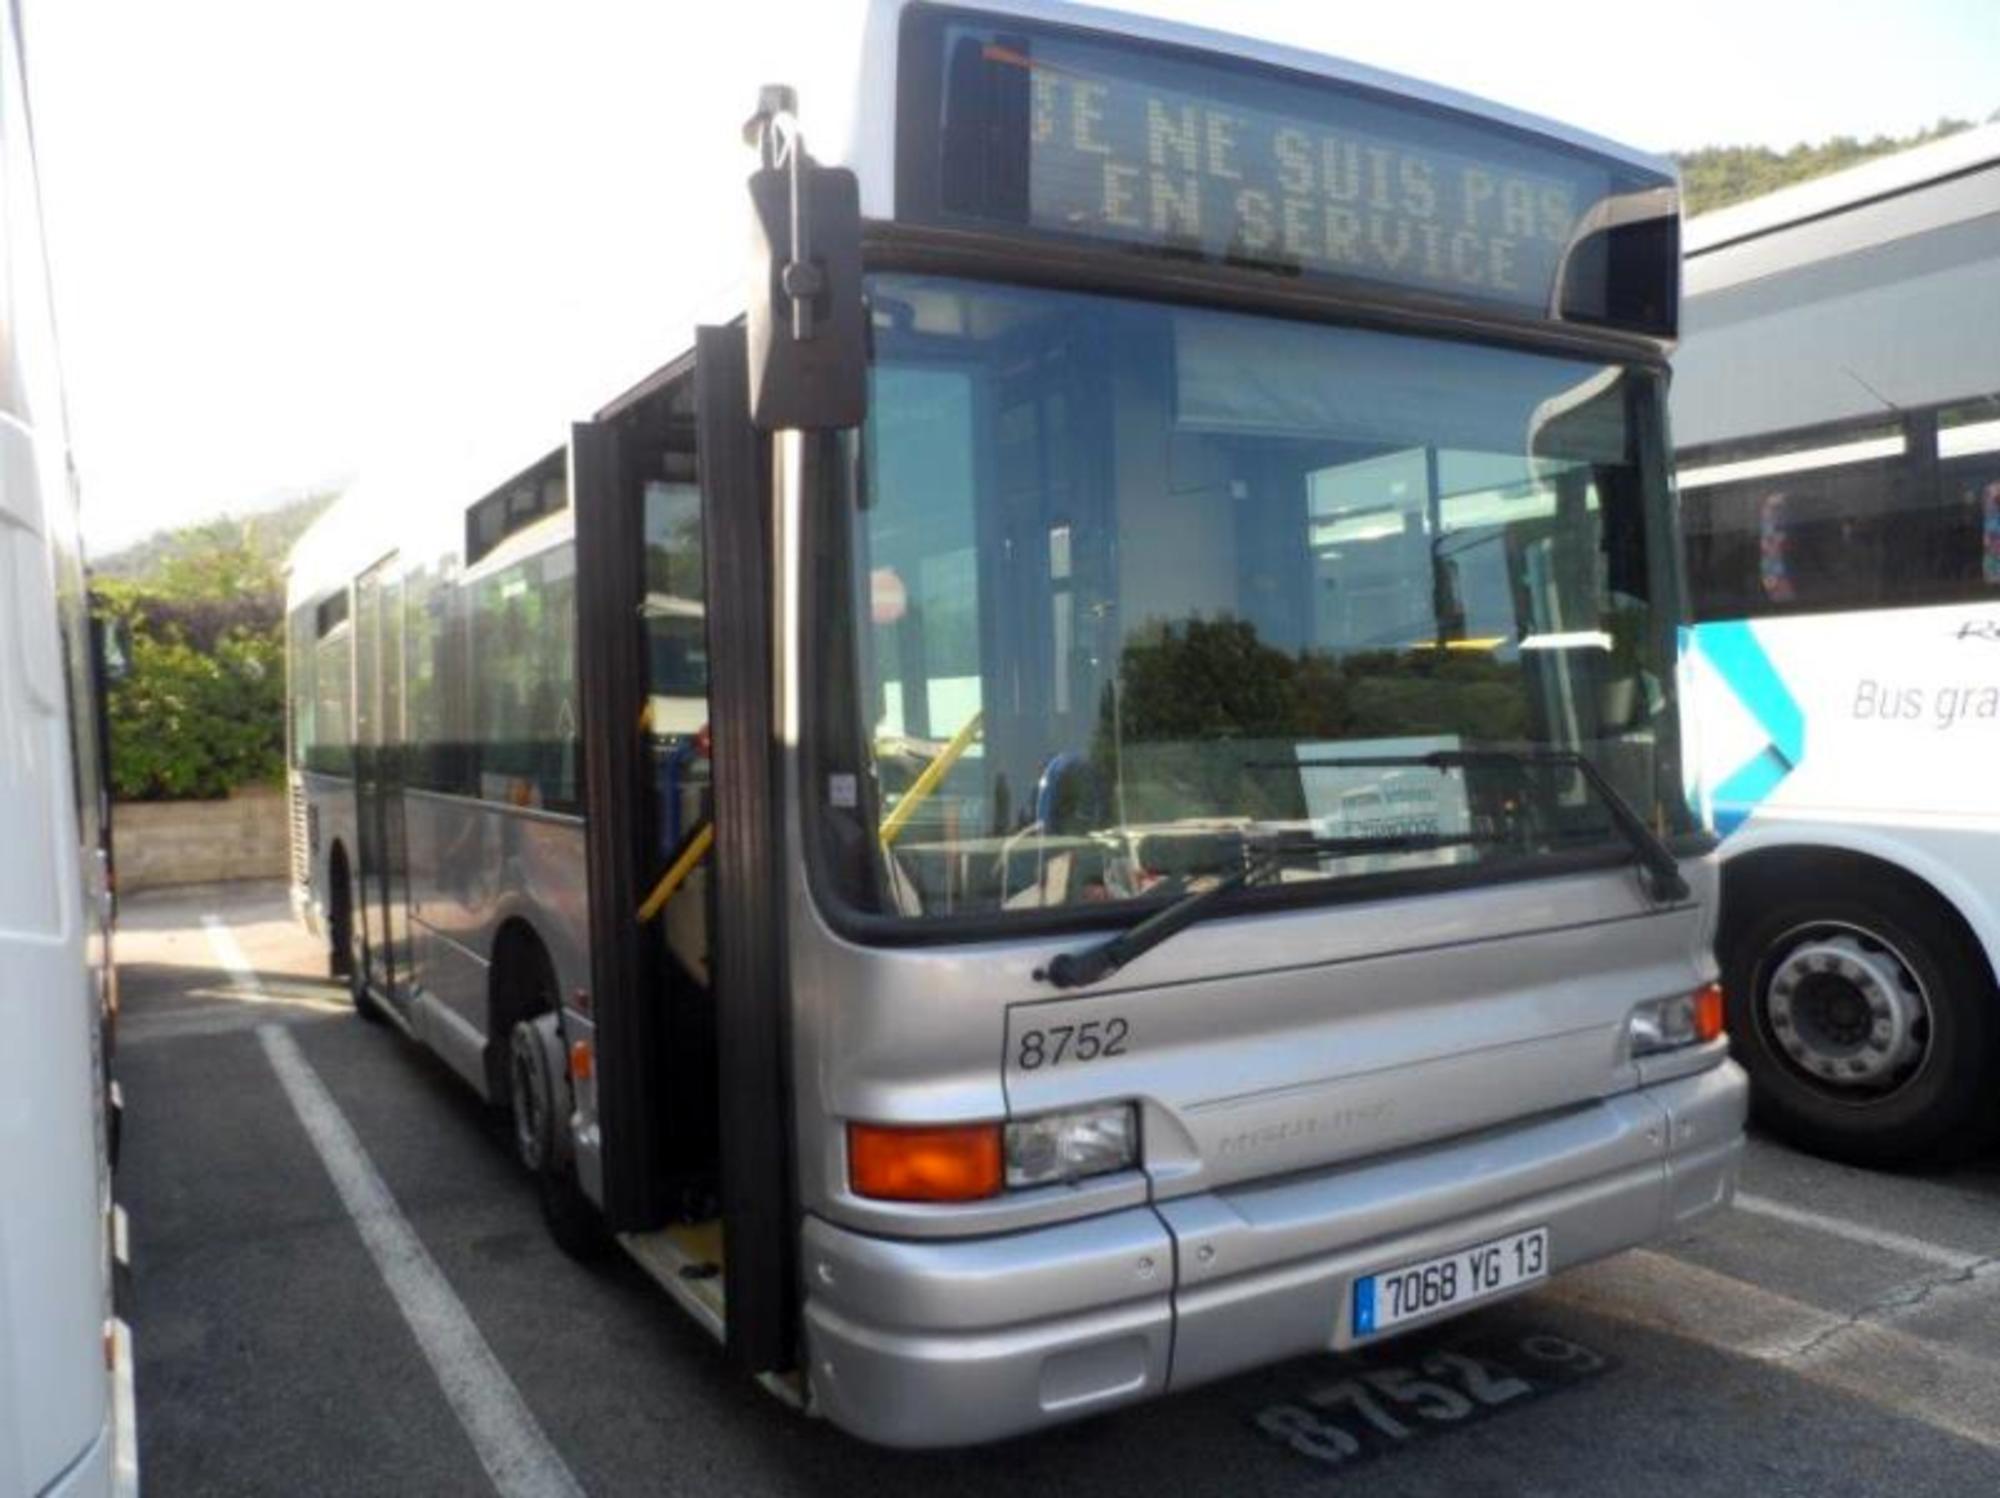 gx117 heuliez 70789 8752 car bus d 39 occasion aux ench res agorastore. Black Bedroom Furniture Sets. Home Design Ideas